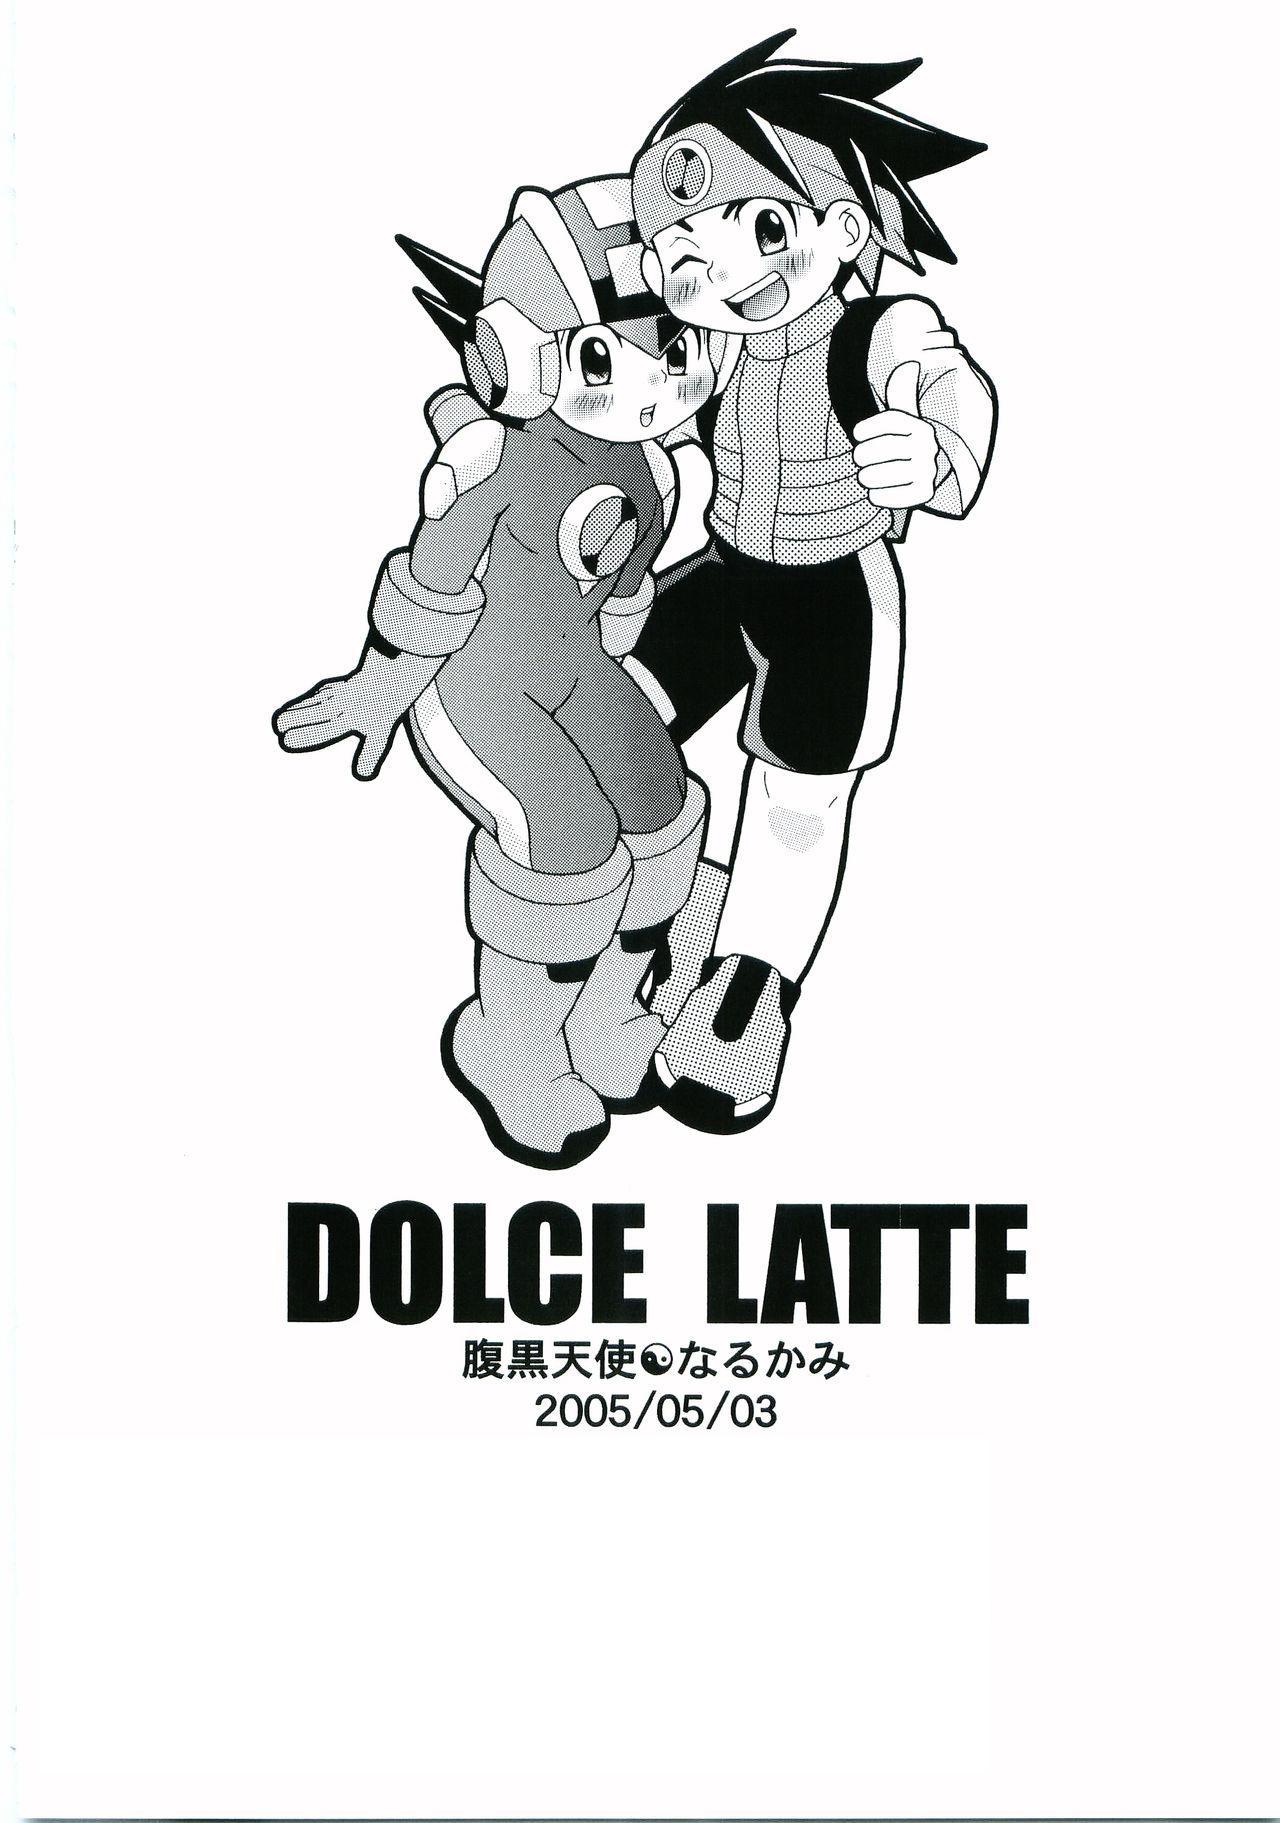 DOLCE LATTE 40